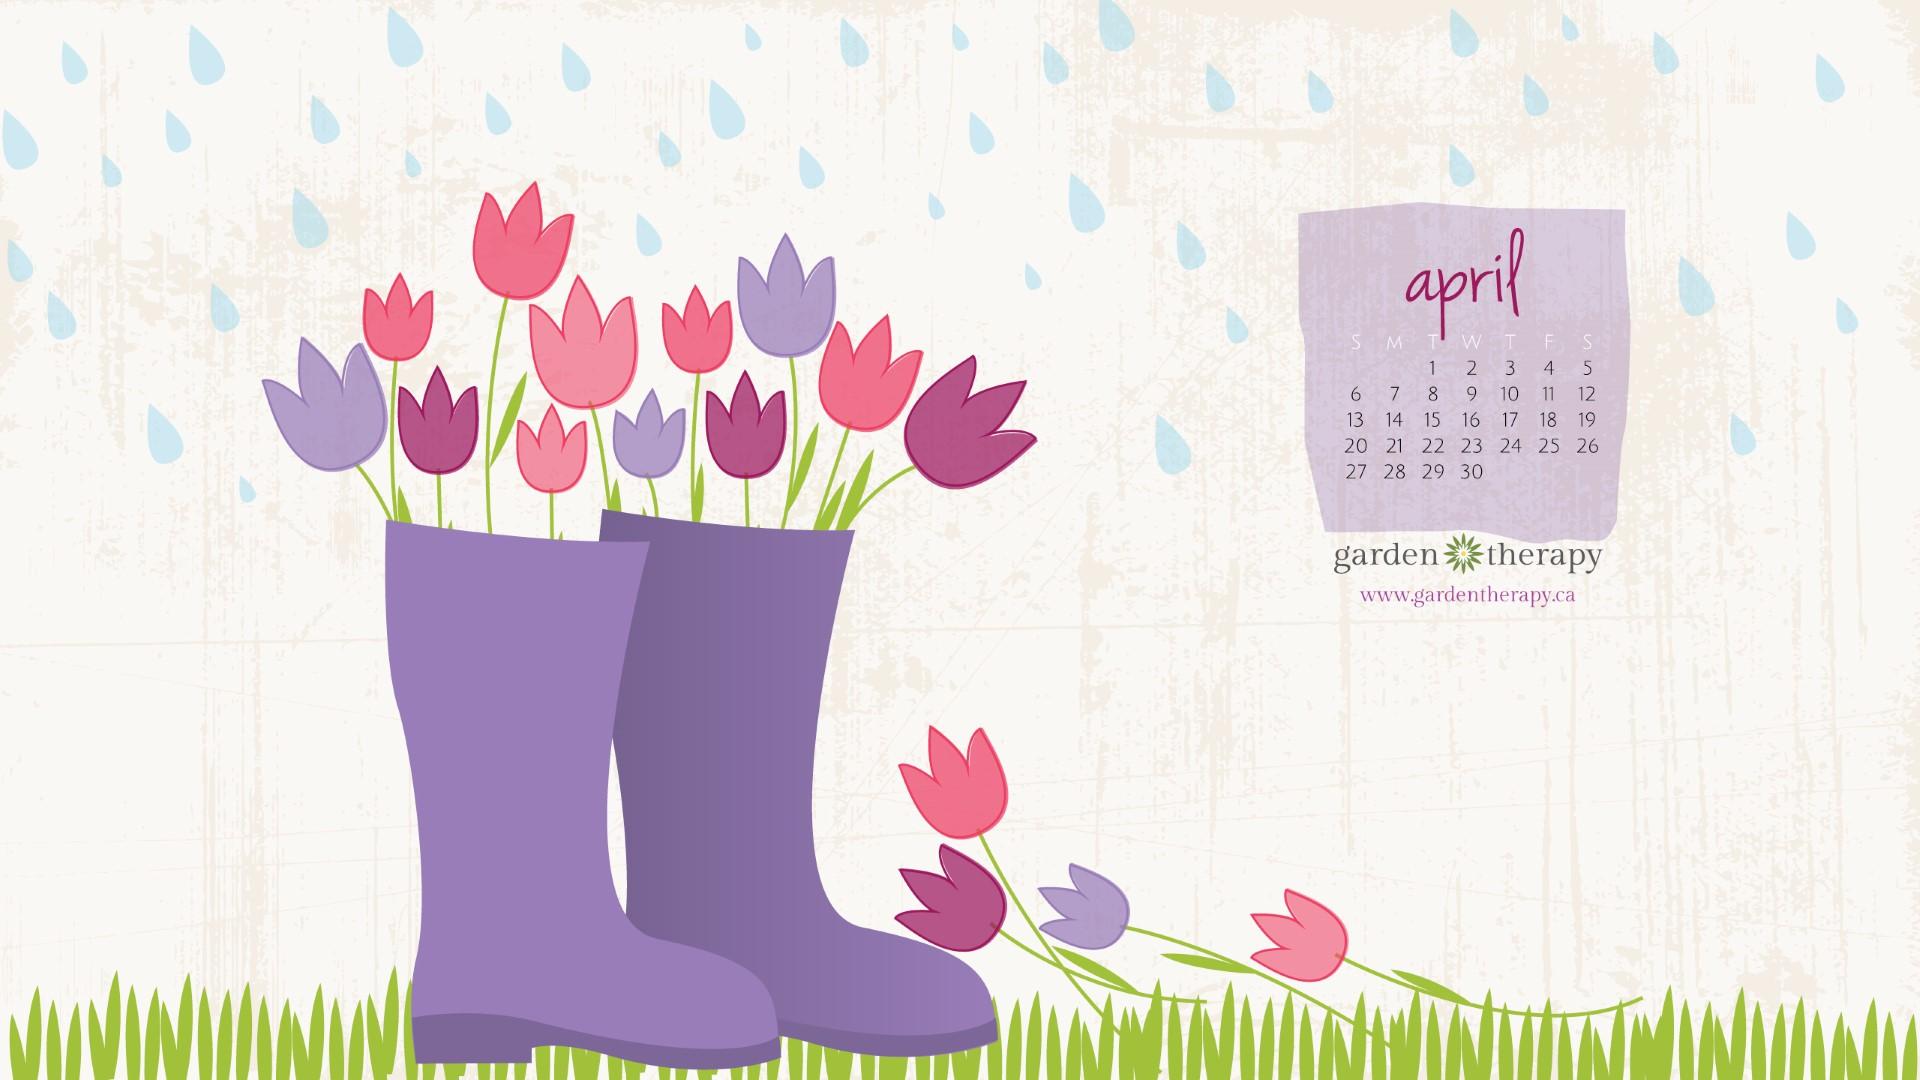 April Showers Bring April S Desktop Calendar And Garden